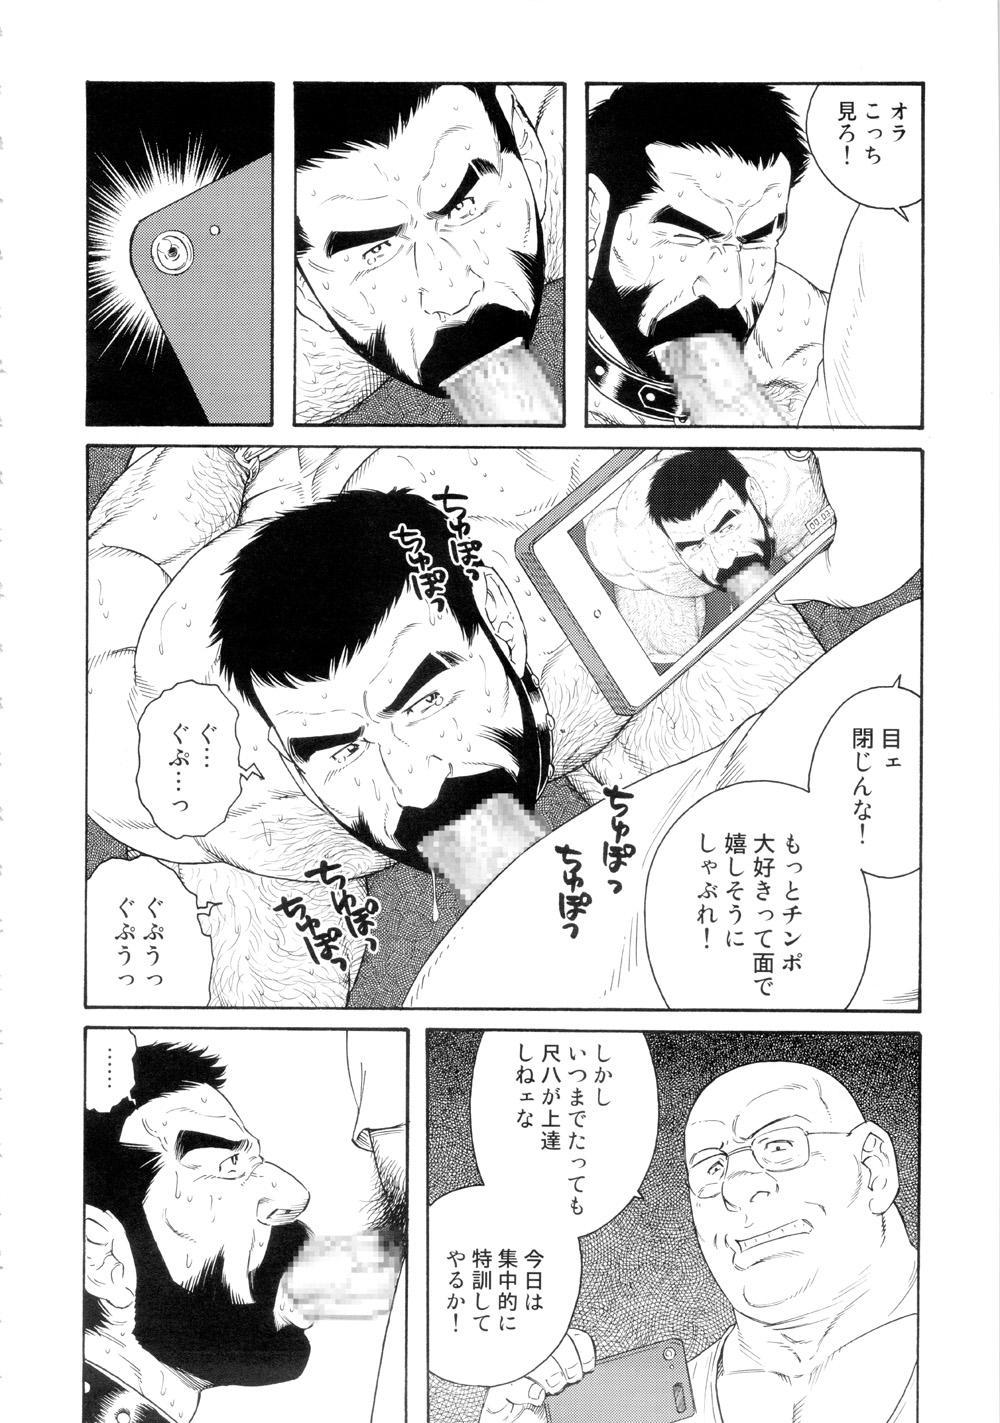 Genryu Chapter 1 13